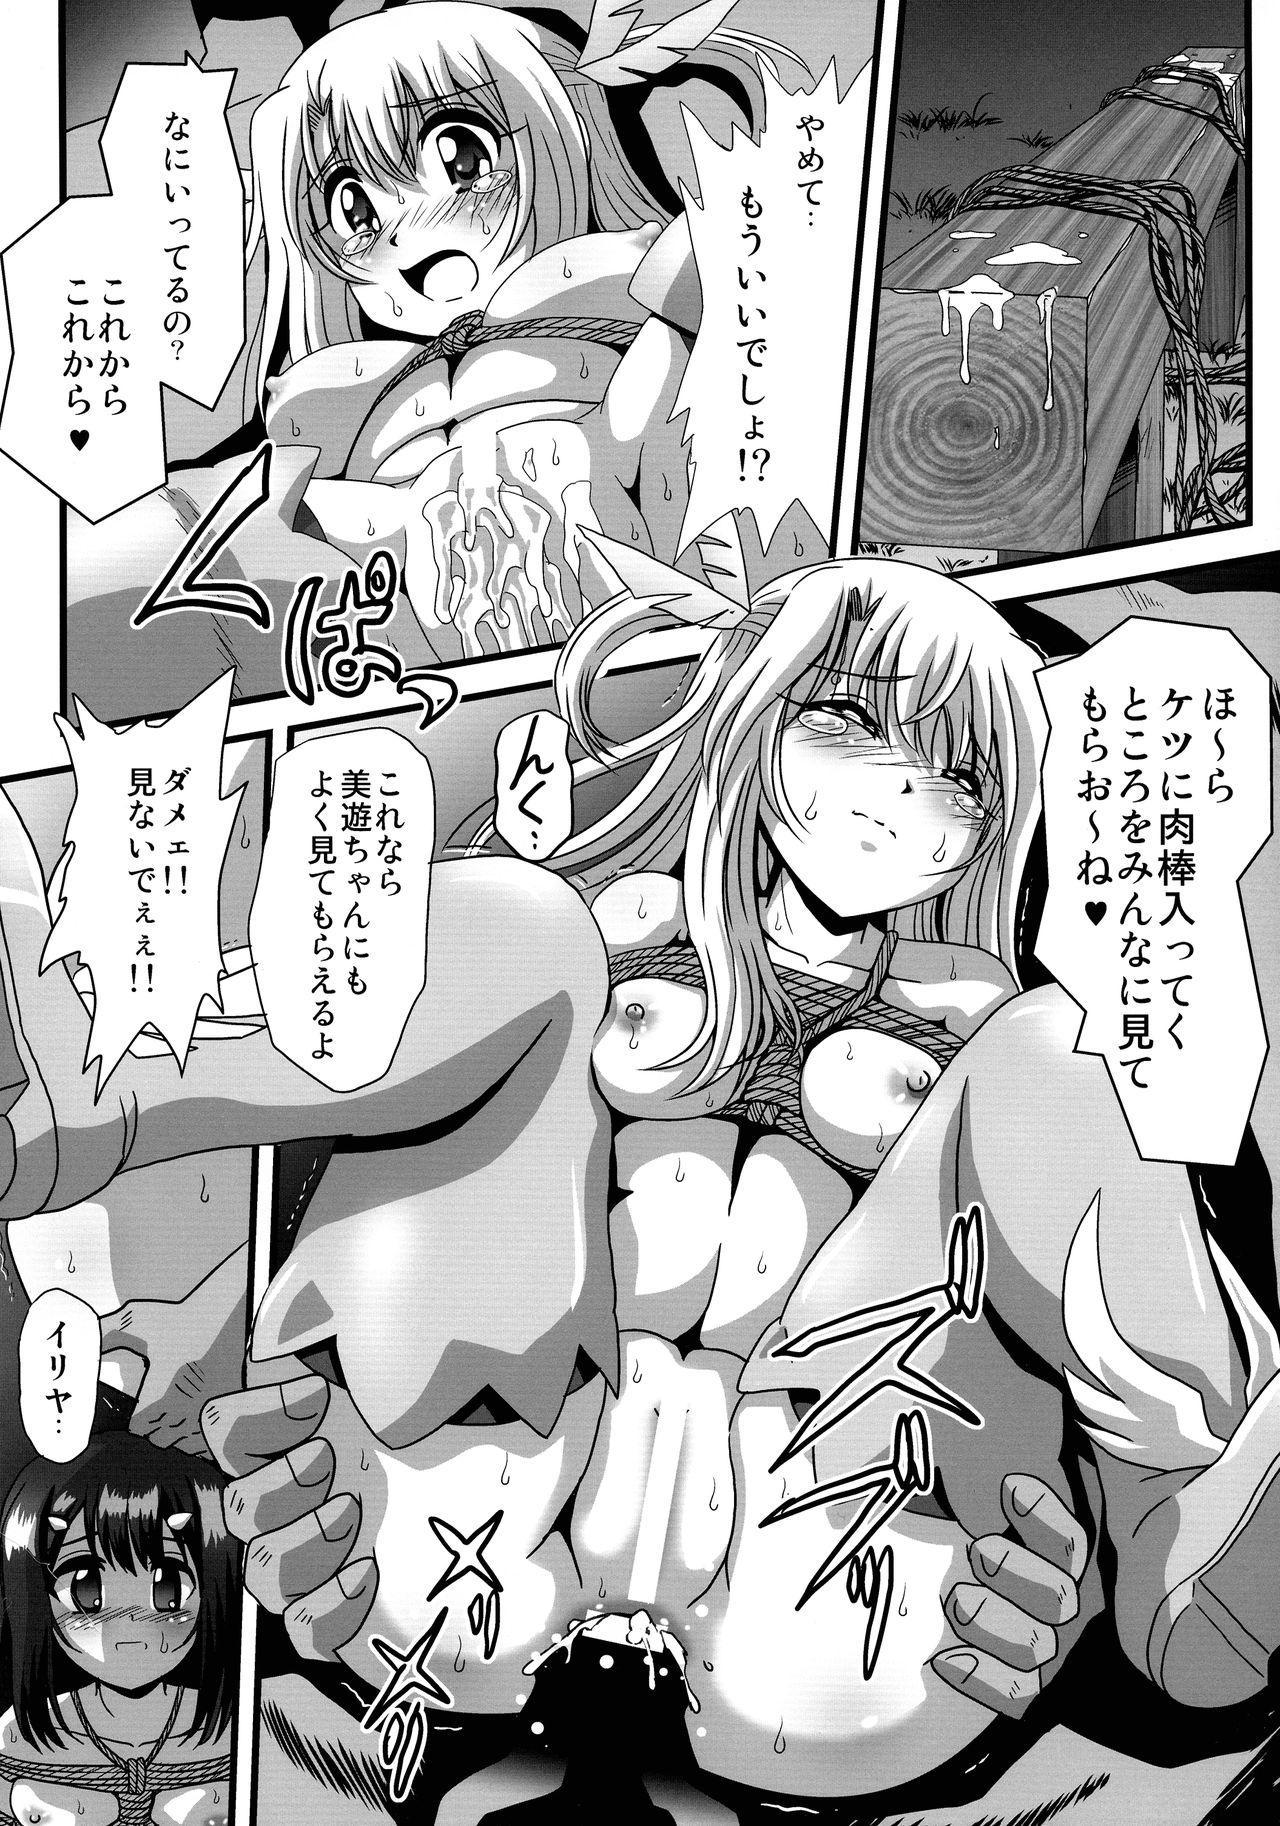 Wana ni Ochita Eiyuu Shoukan 3 15